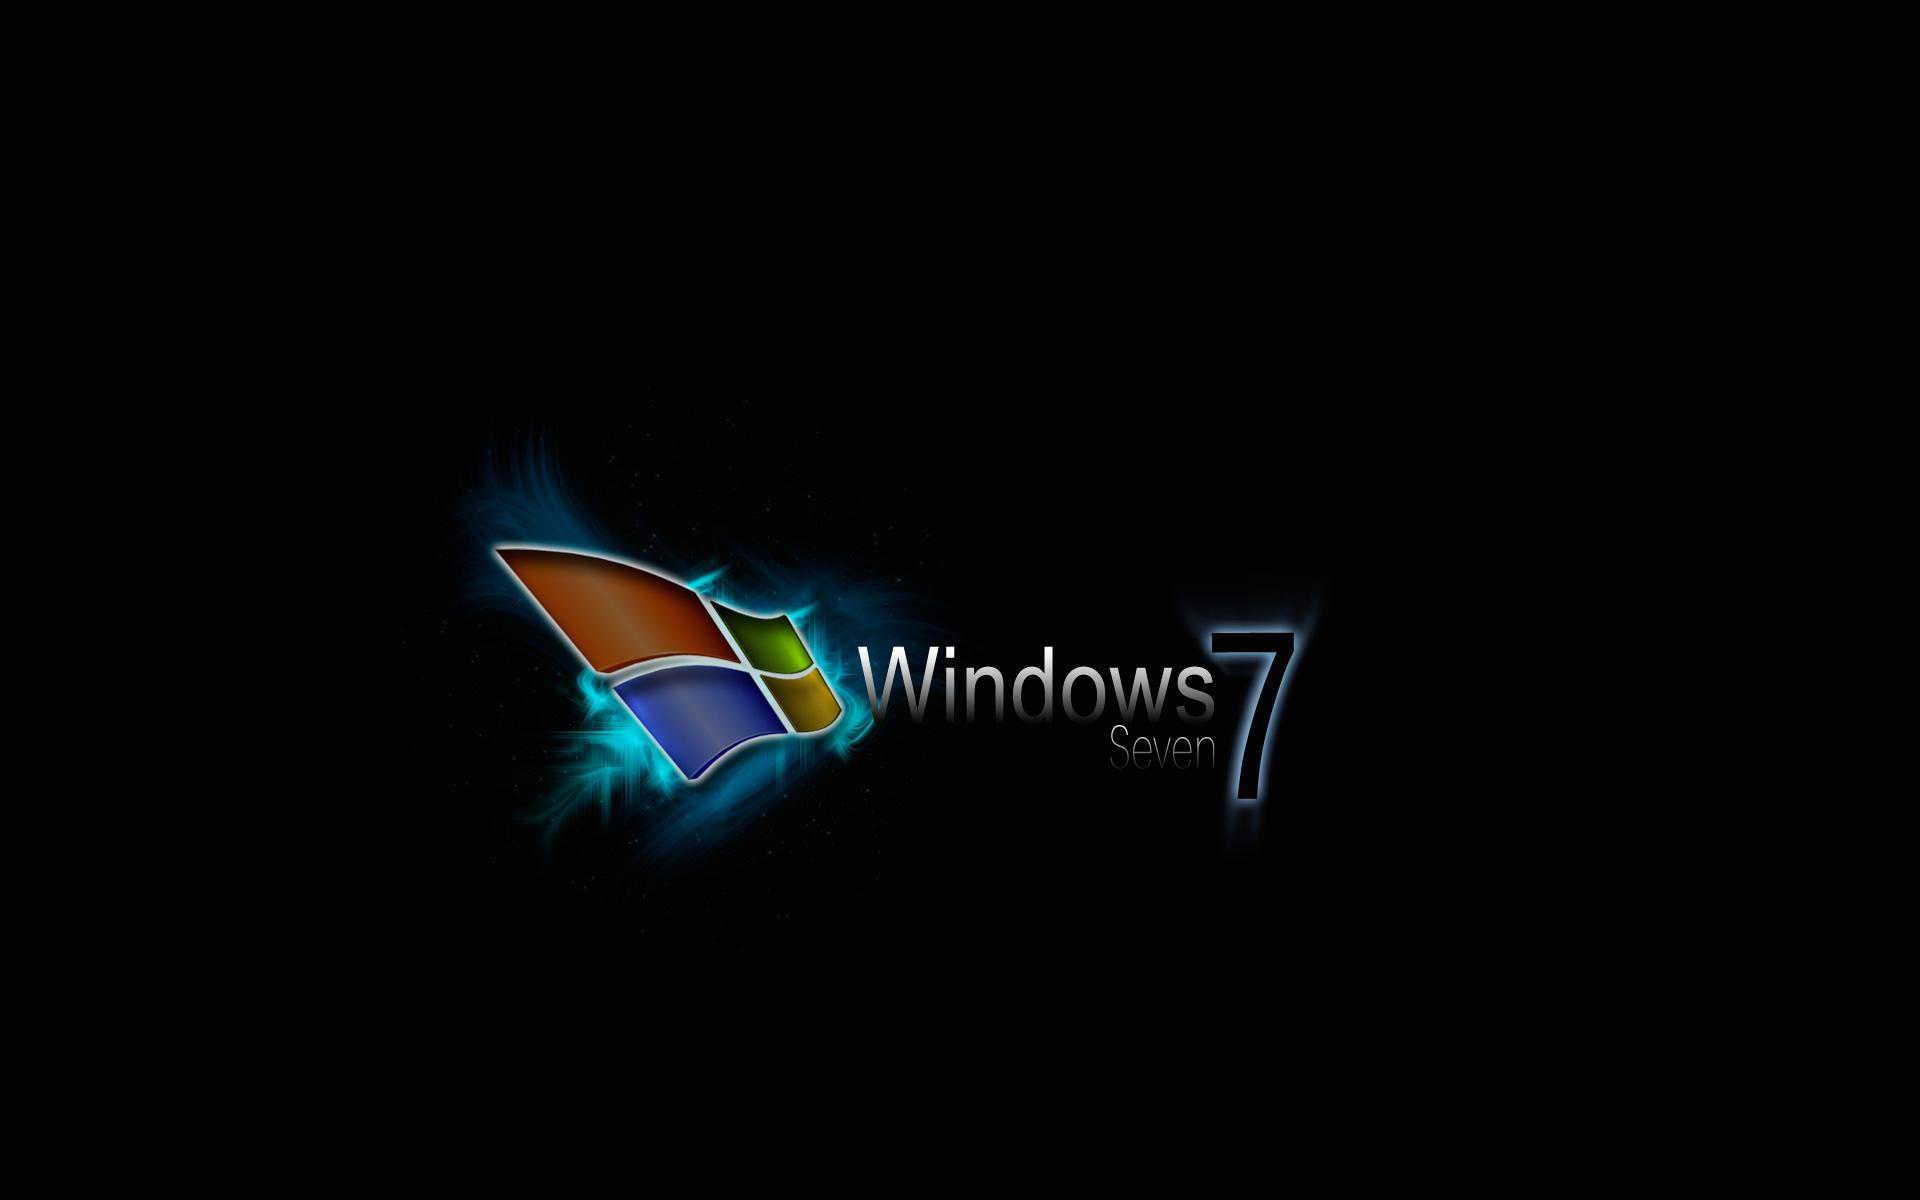 desktop backgrounds Hd microsoft desktop backgrounds Desktop 1920x1200